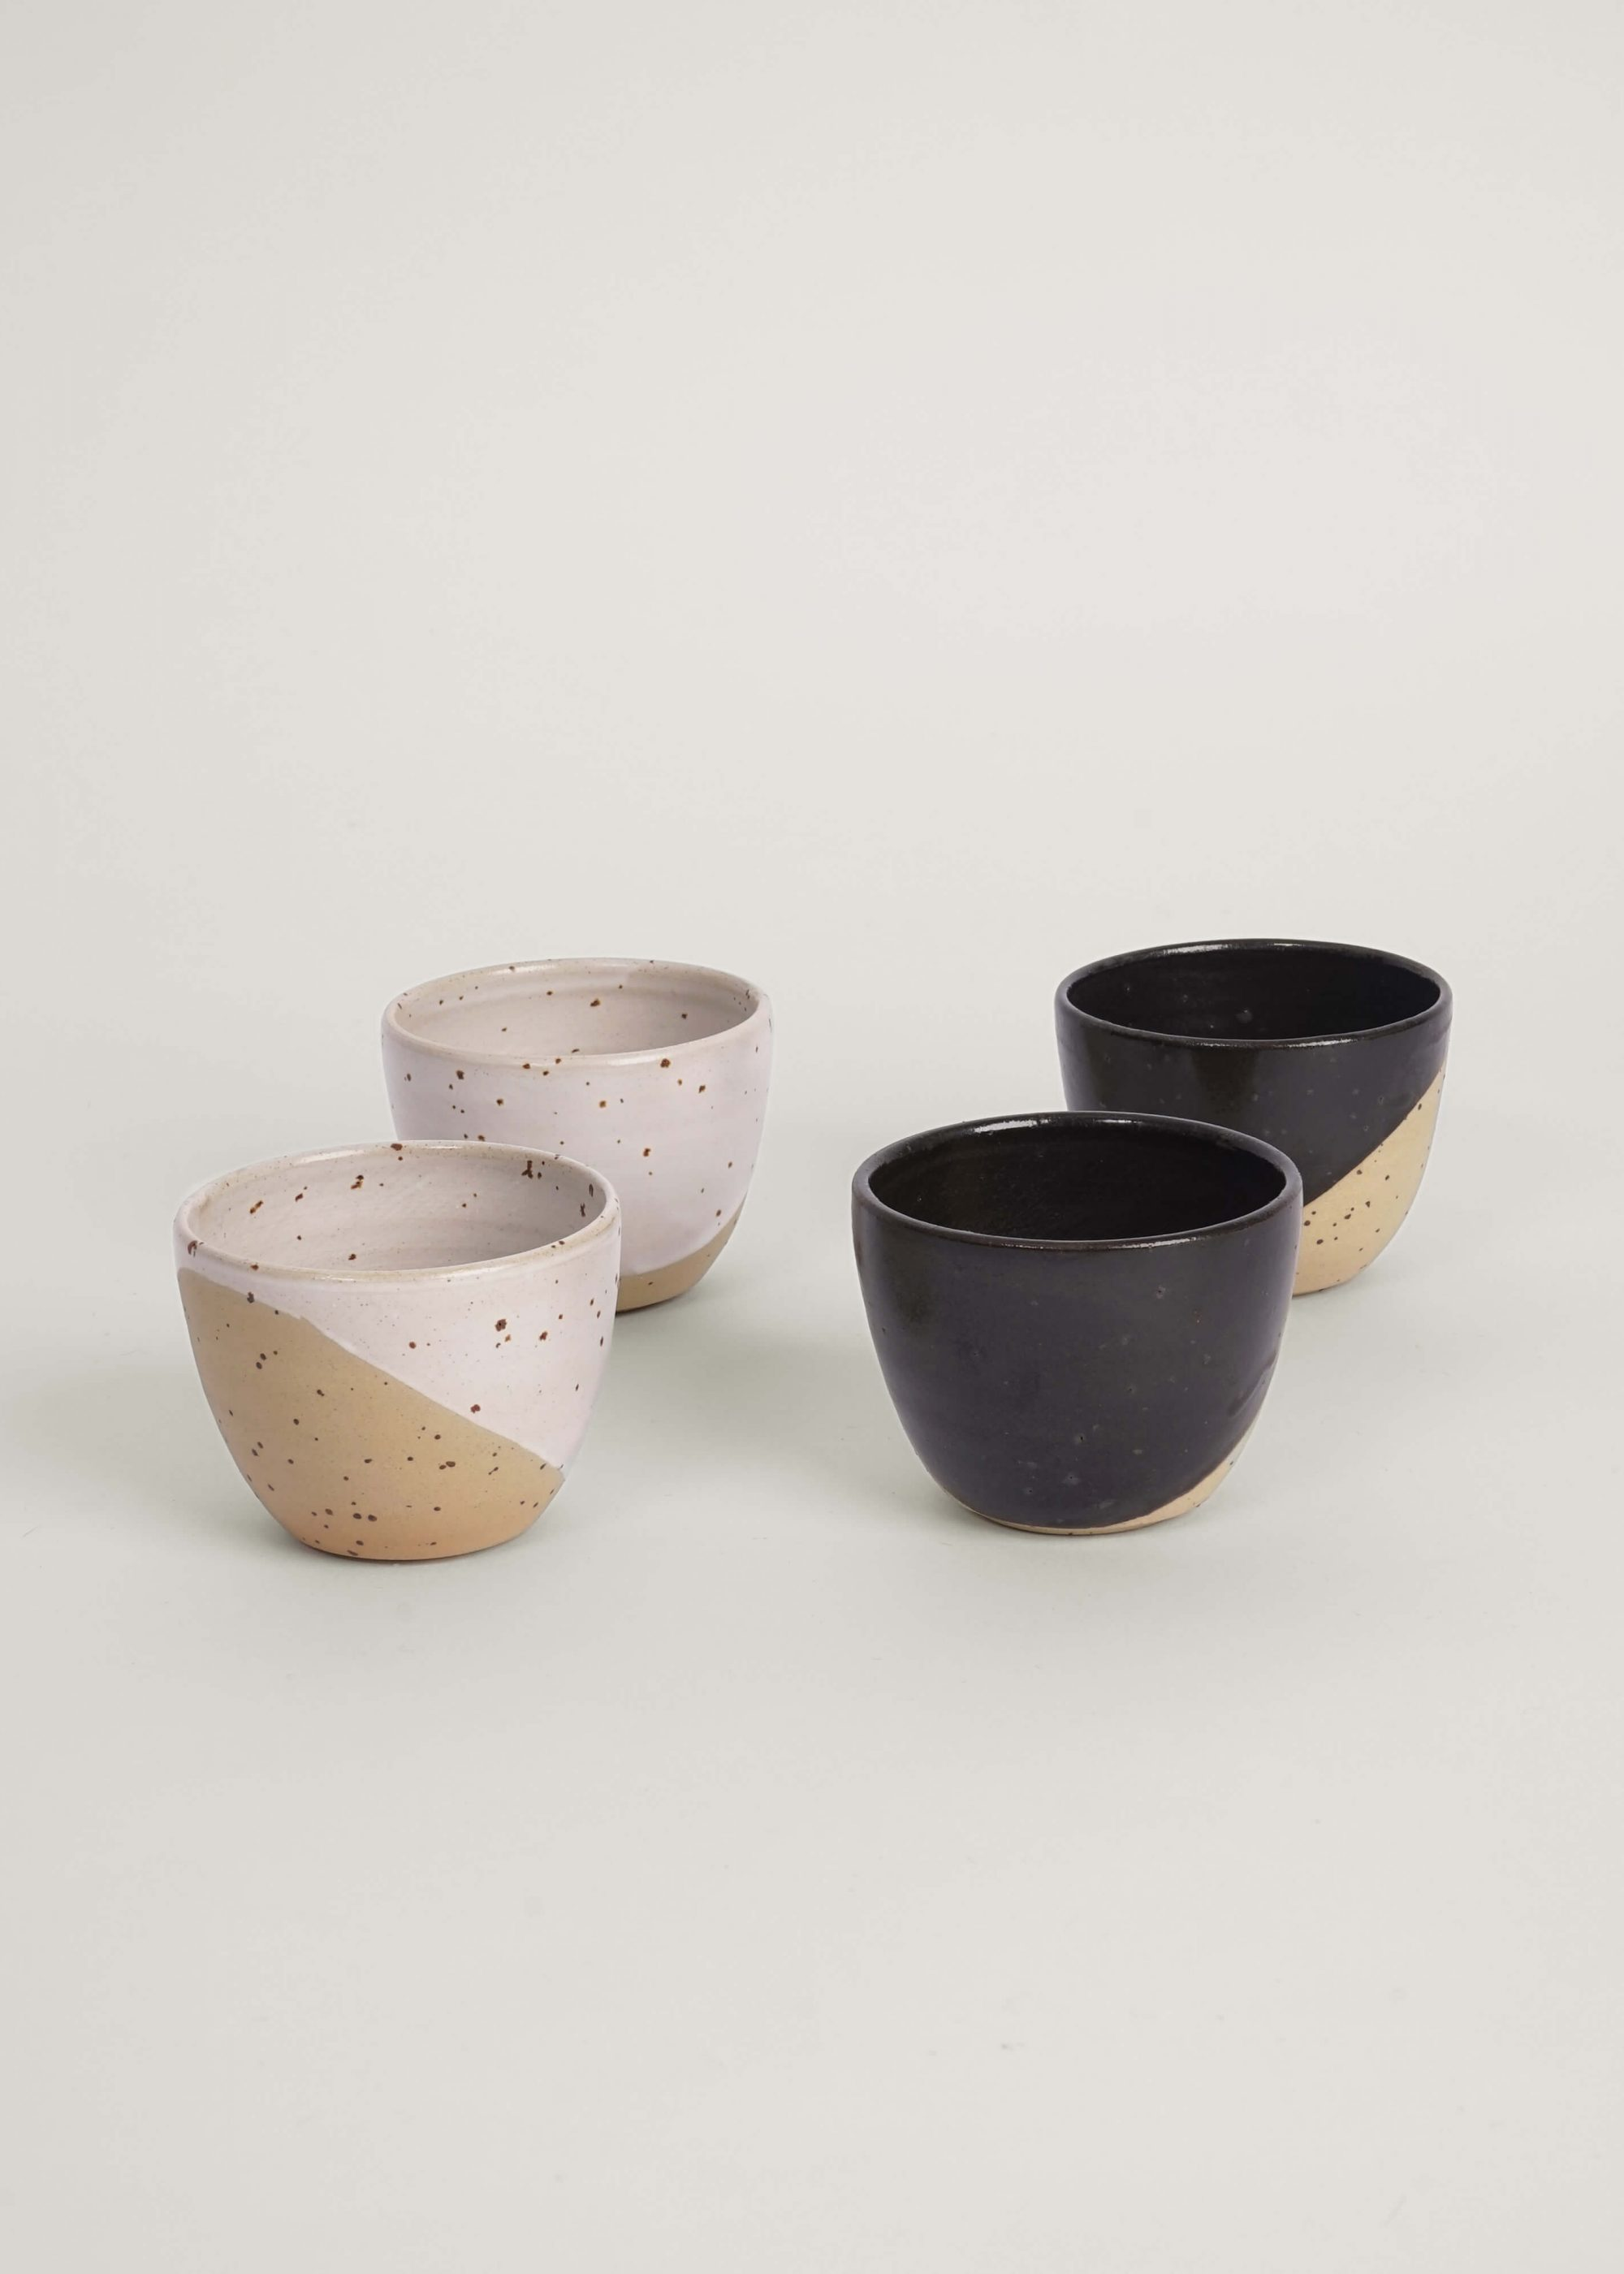 Product image for N° ICF6 Espresso & Sake Cup Set